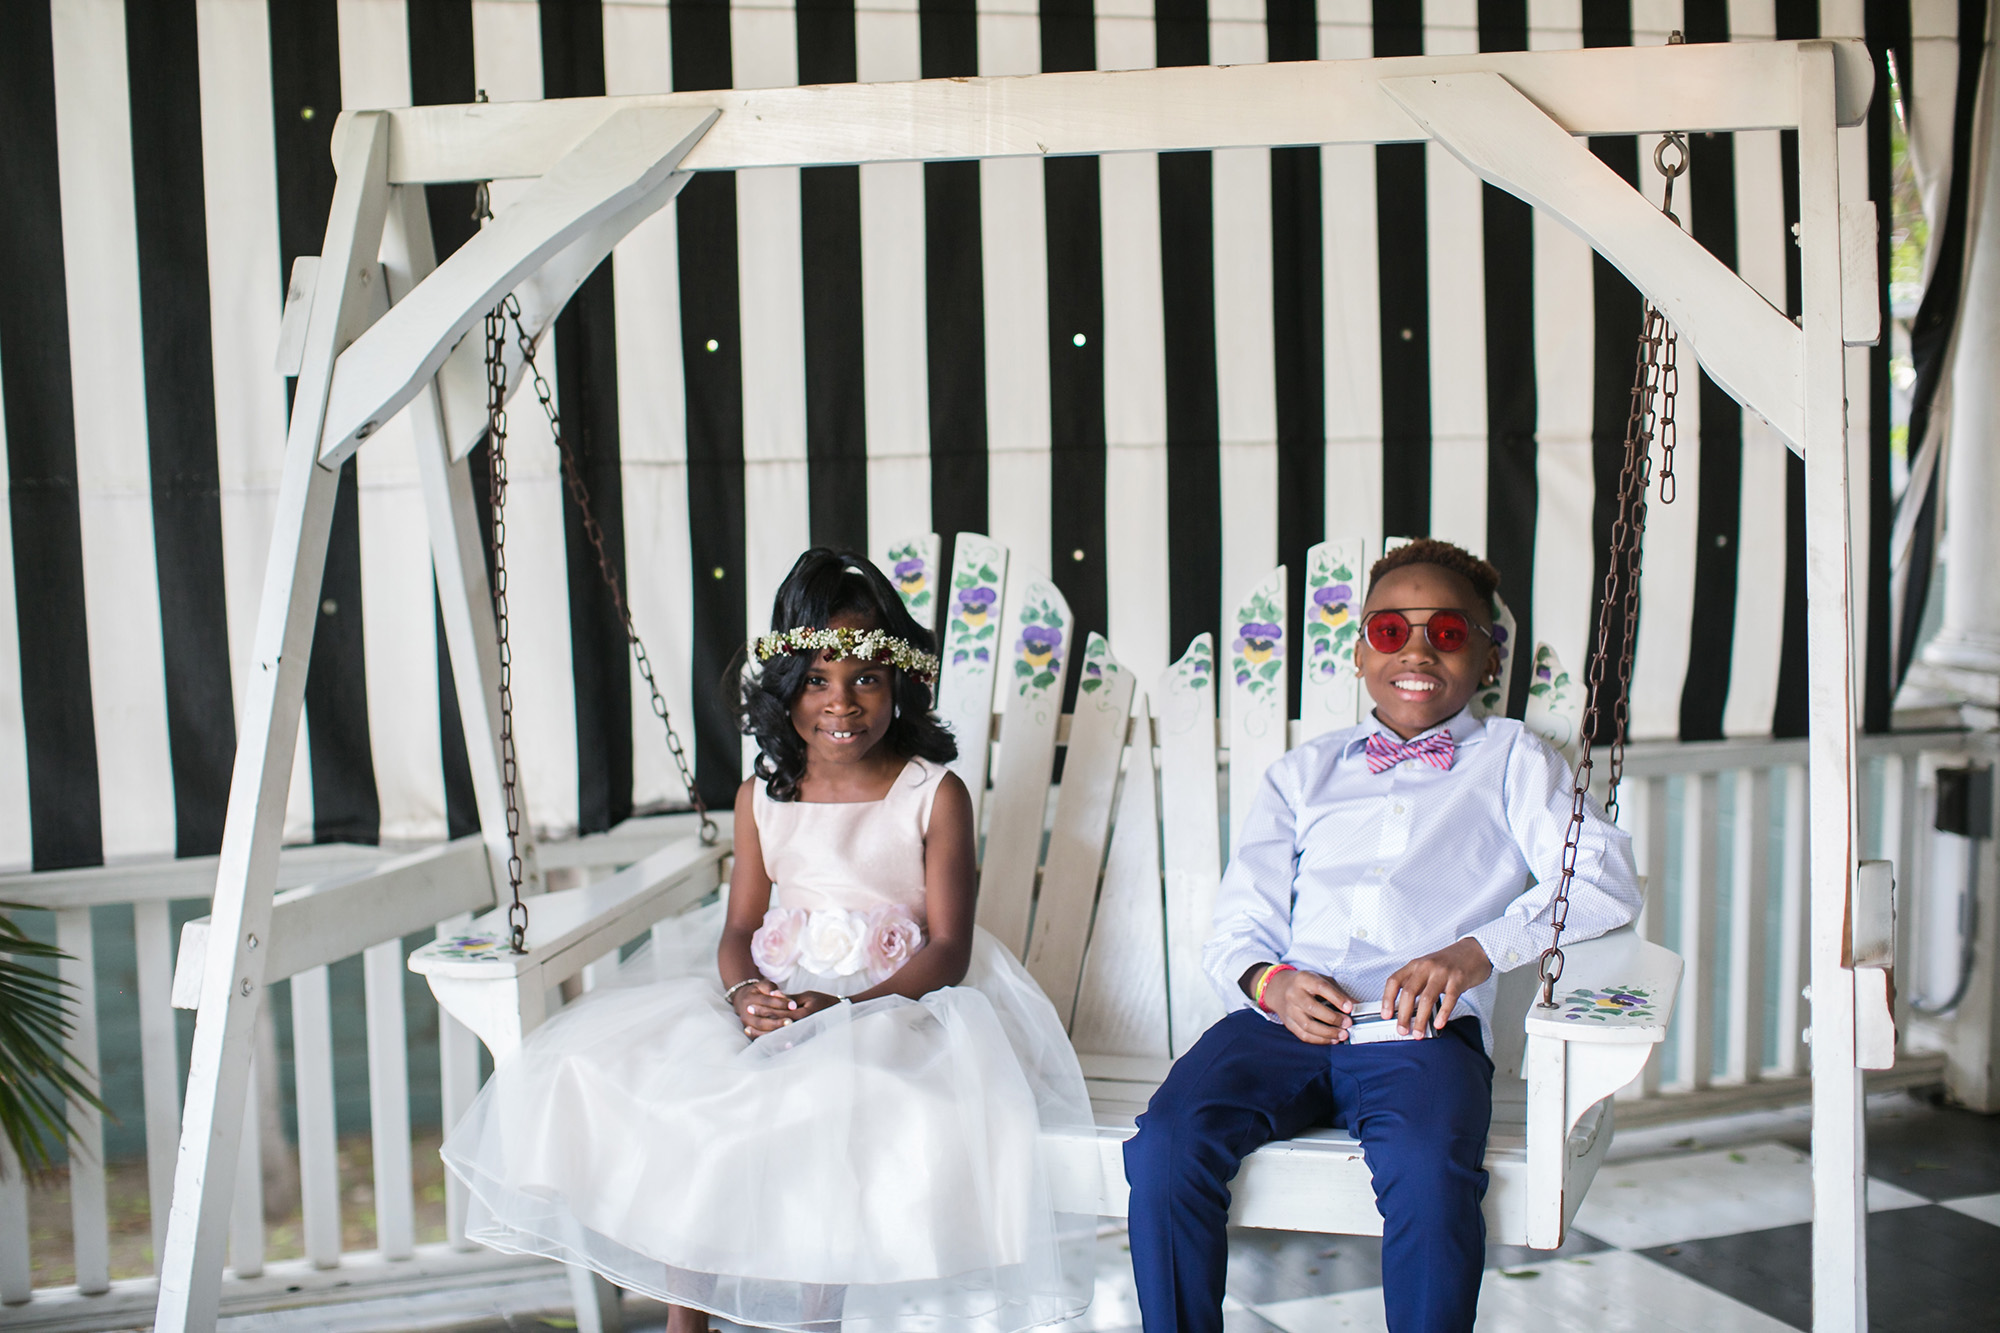 associate-photographer-christmas-house-wedding-carrie-vines-0023.jpg